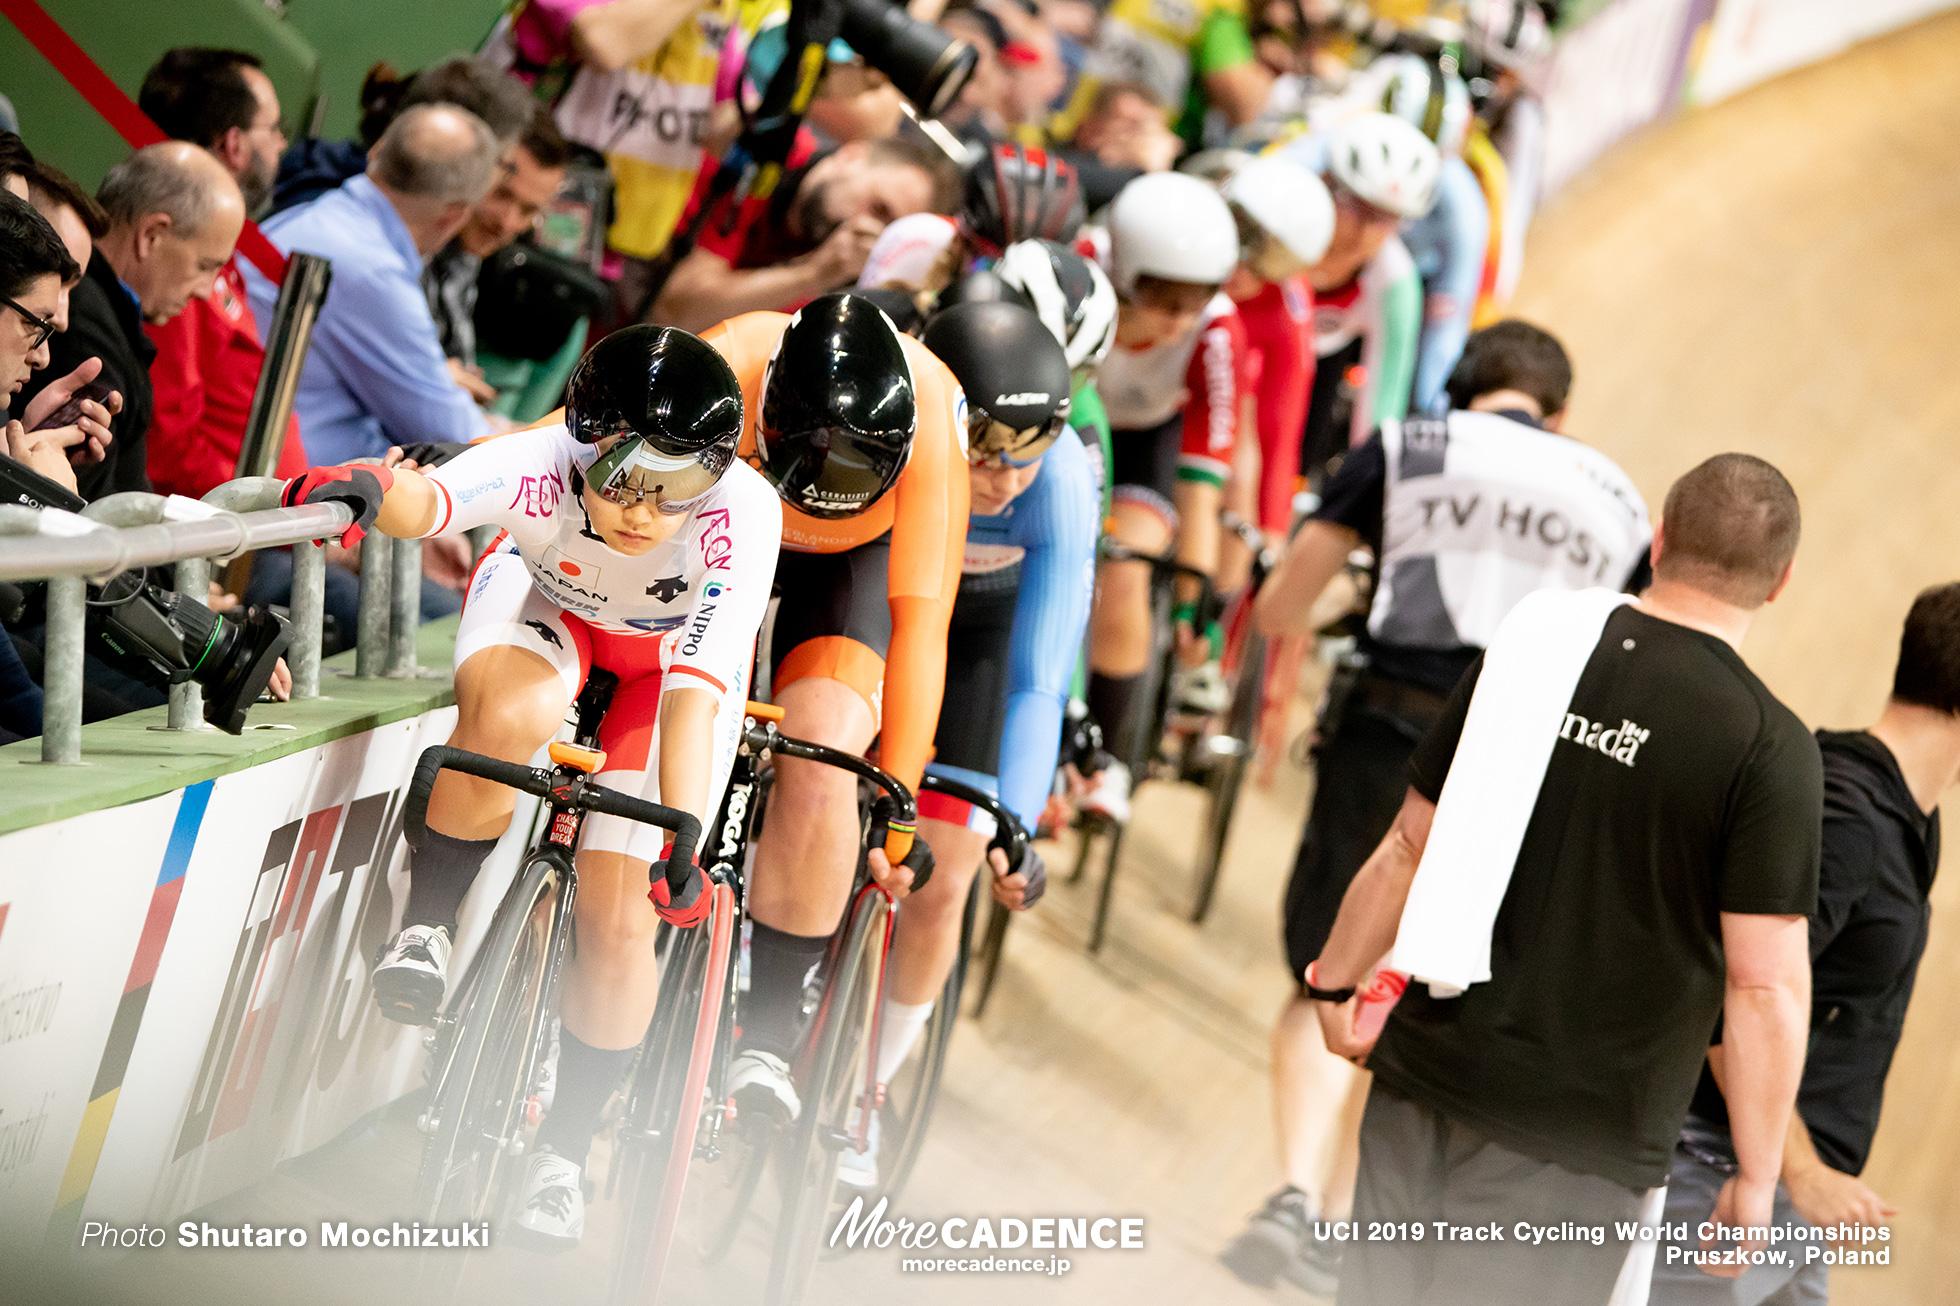 Women's Omnium Elimination / 2019 Track Cycling World Championships Pruszków, Poland